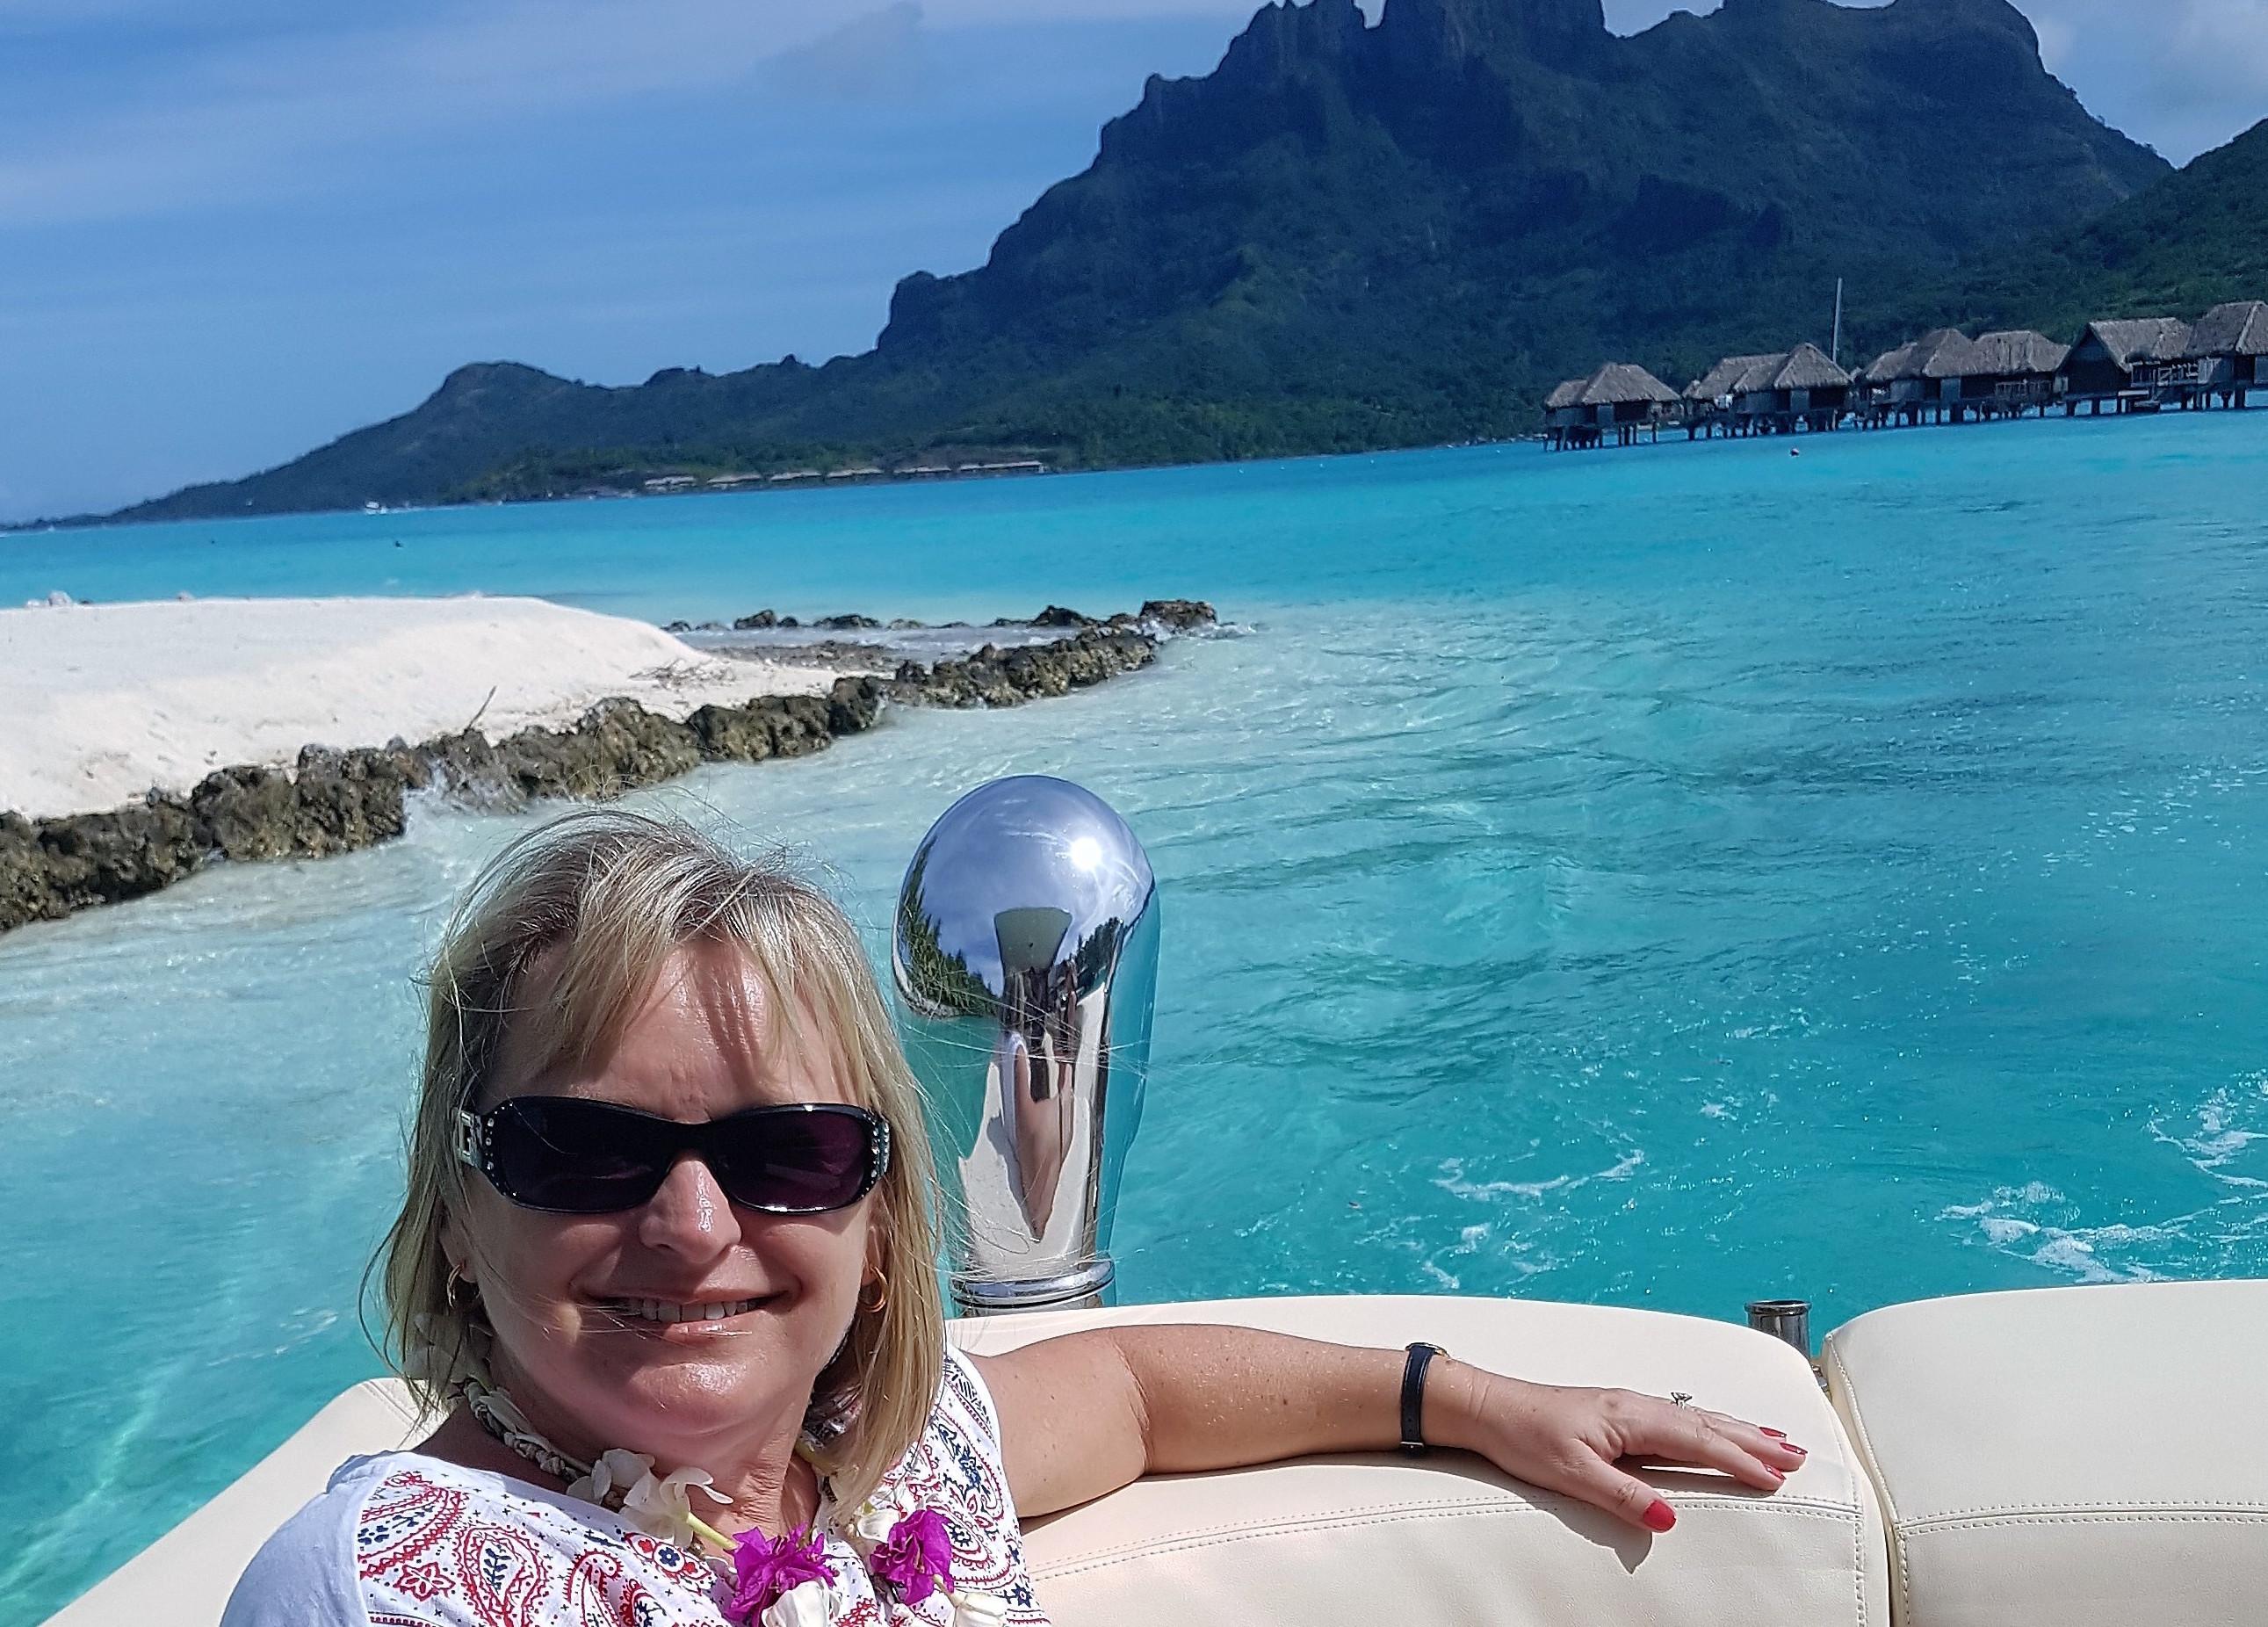 MTA - Jukie Evans - Four Seasons Bora Bora June 2017